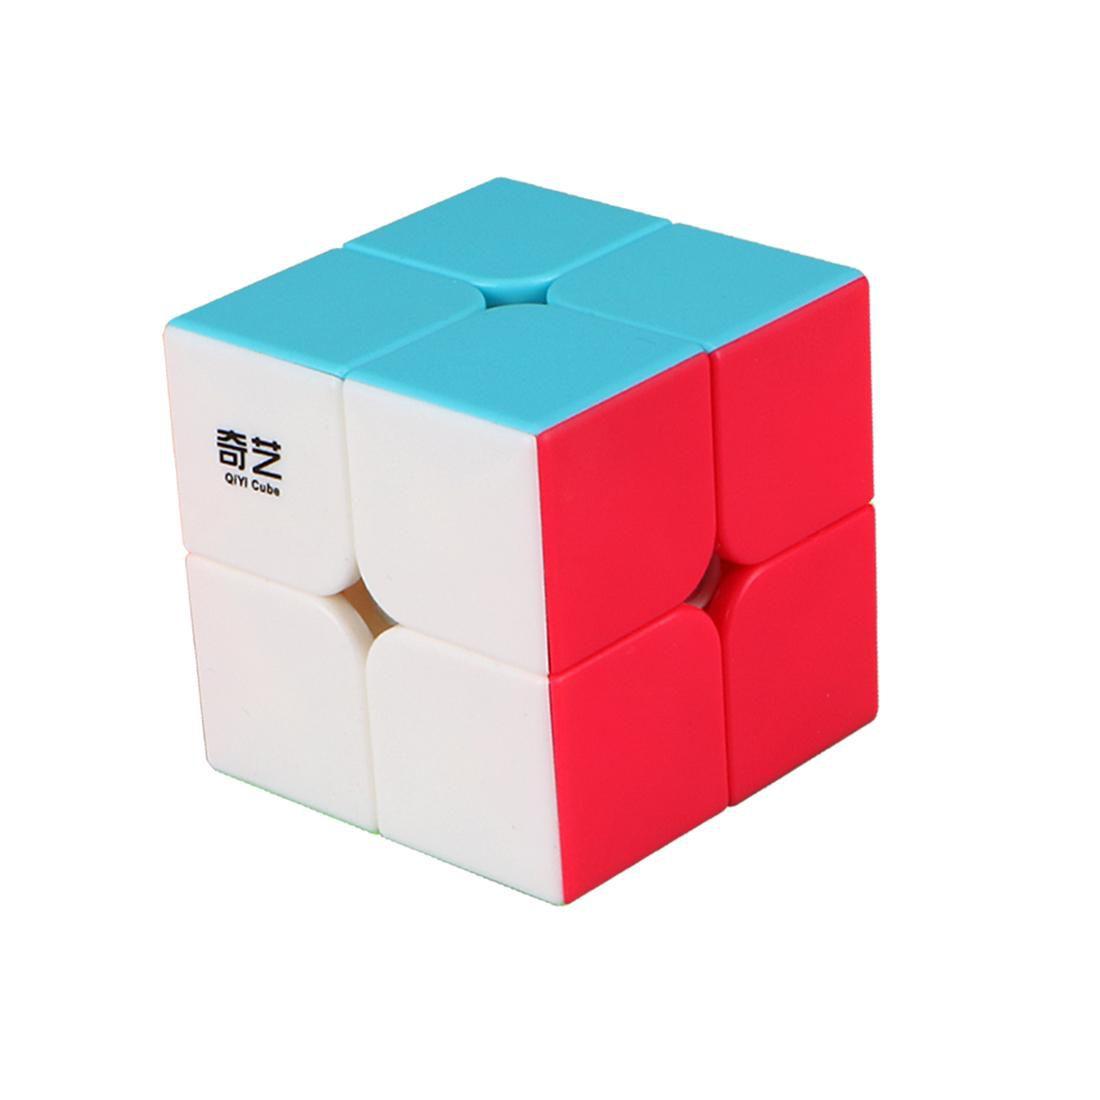 Cubo Mágico Profissional 2x2 - sem adesivo